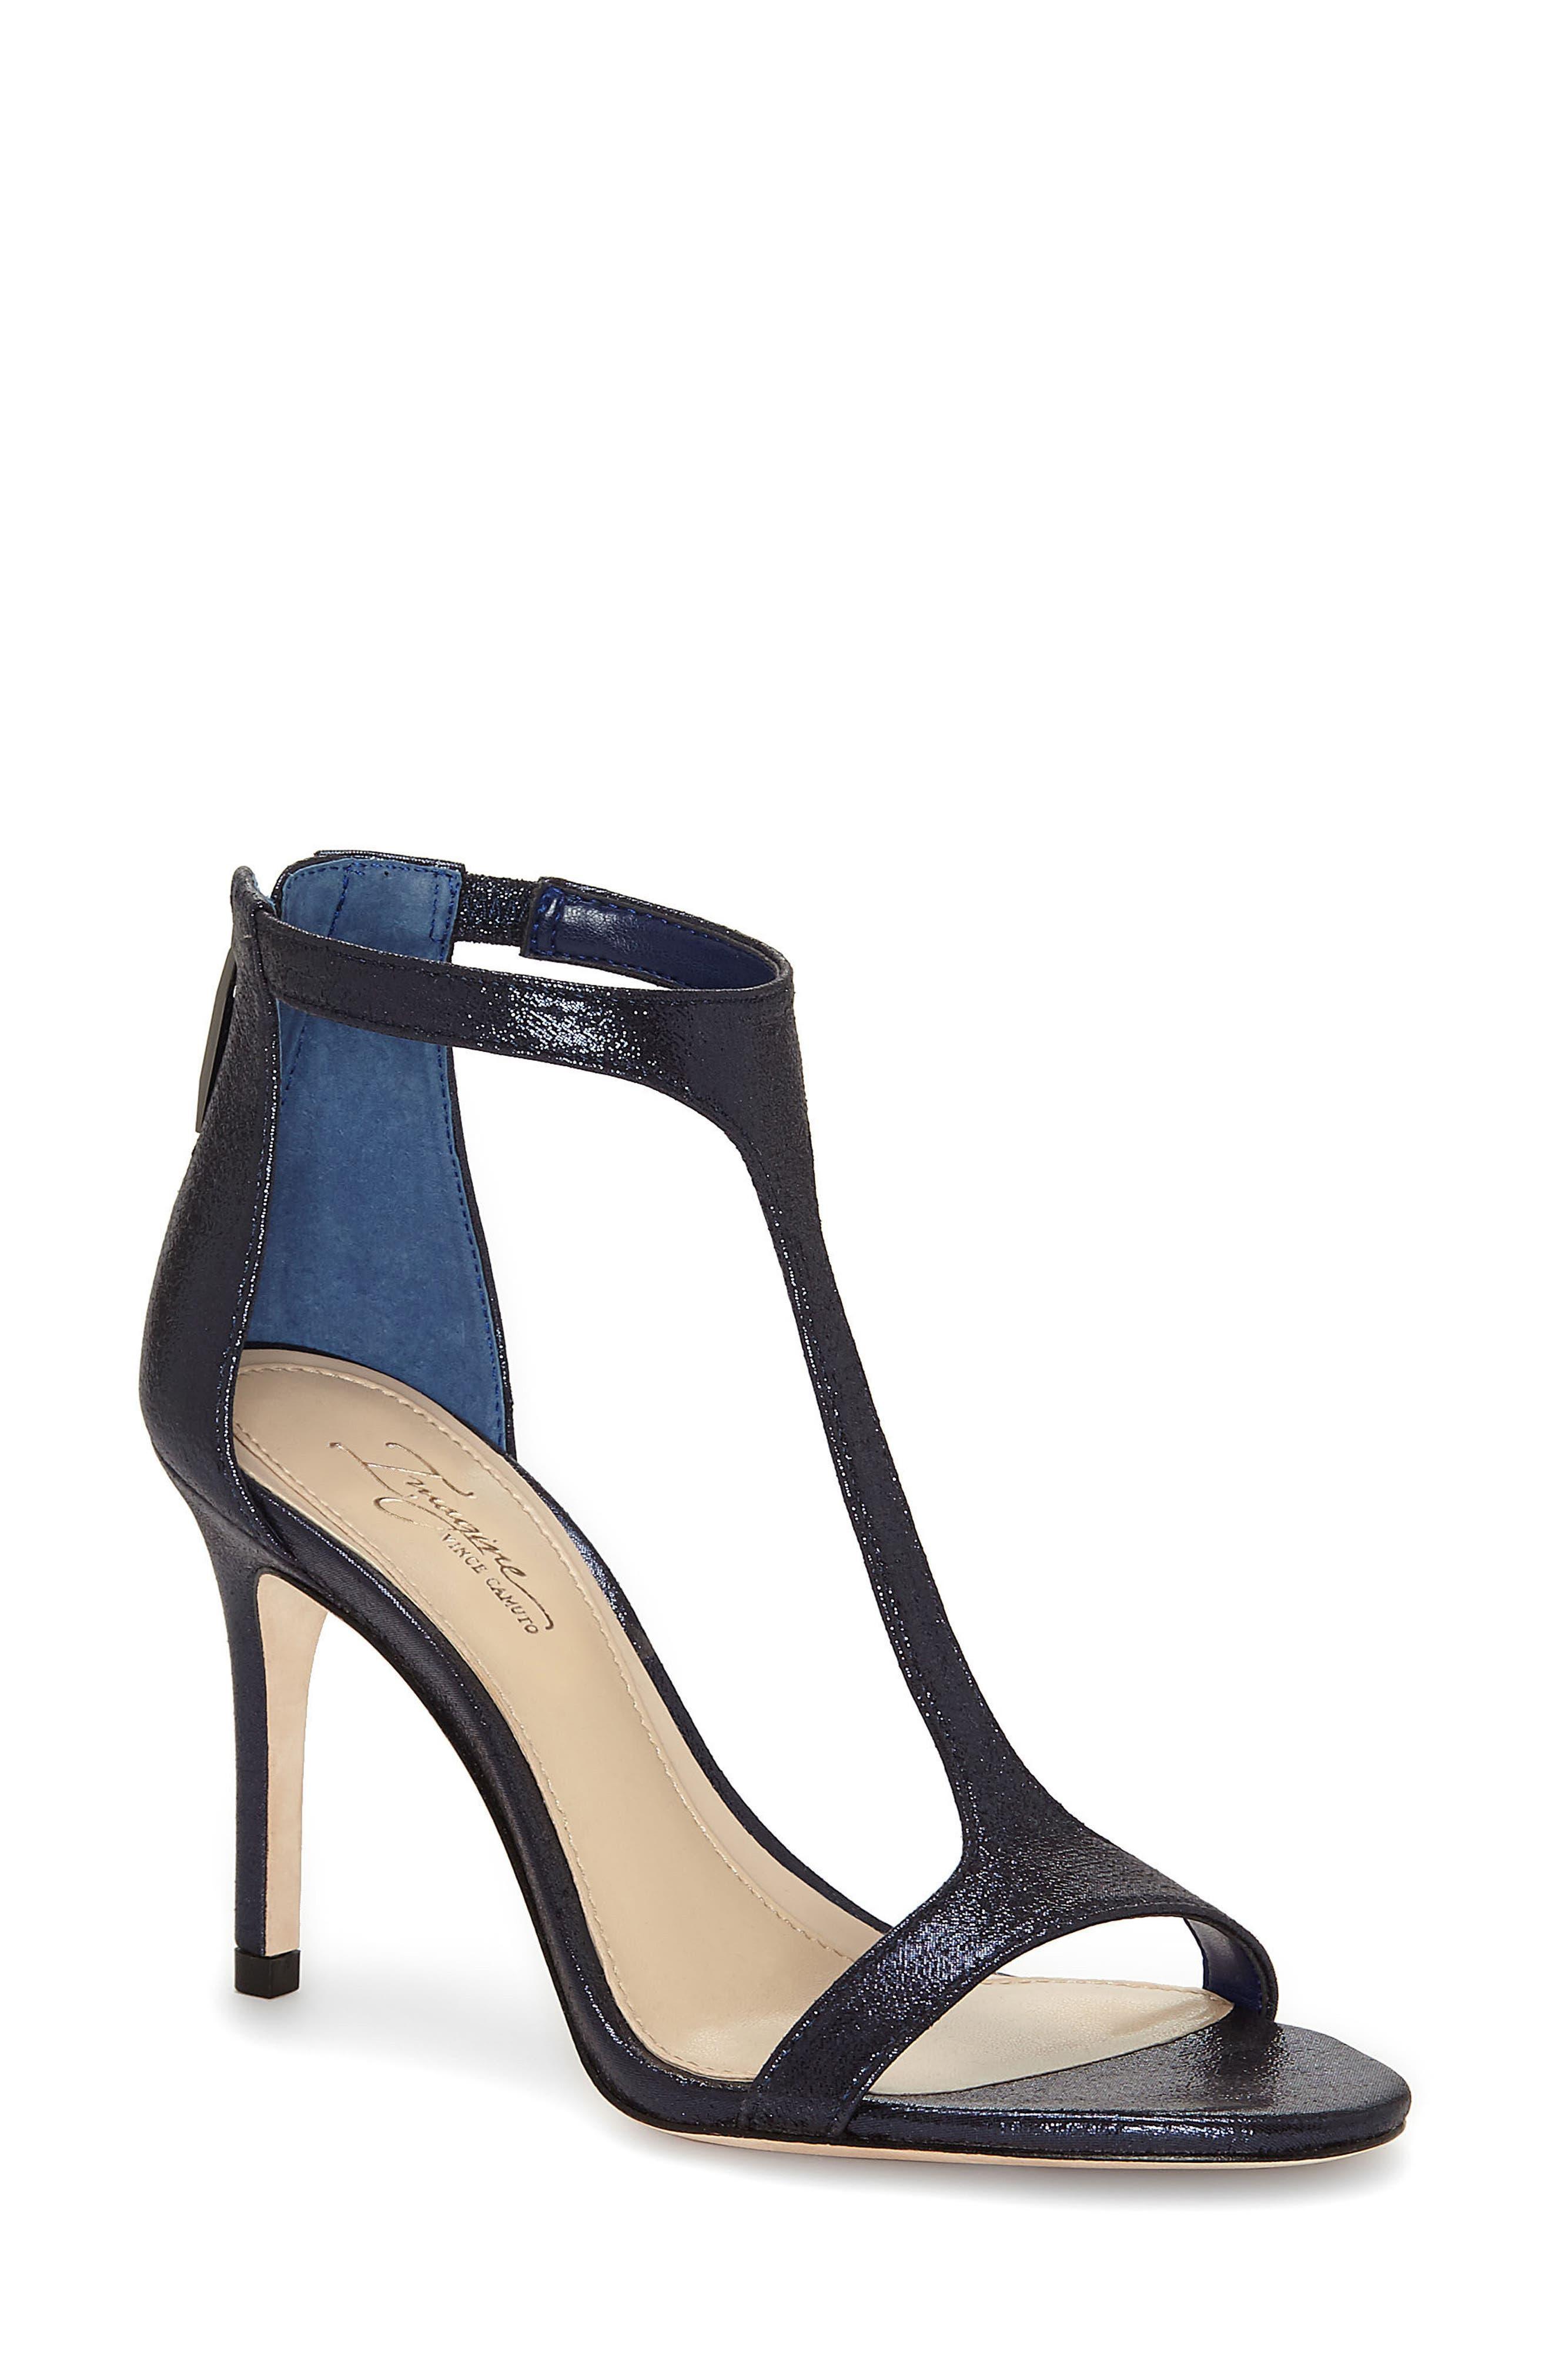 'Phoebe' Embellished T-Strap Sandal,                             Main thumbnail 2, color,